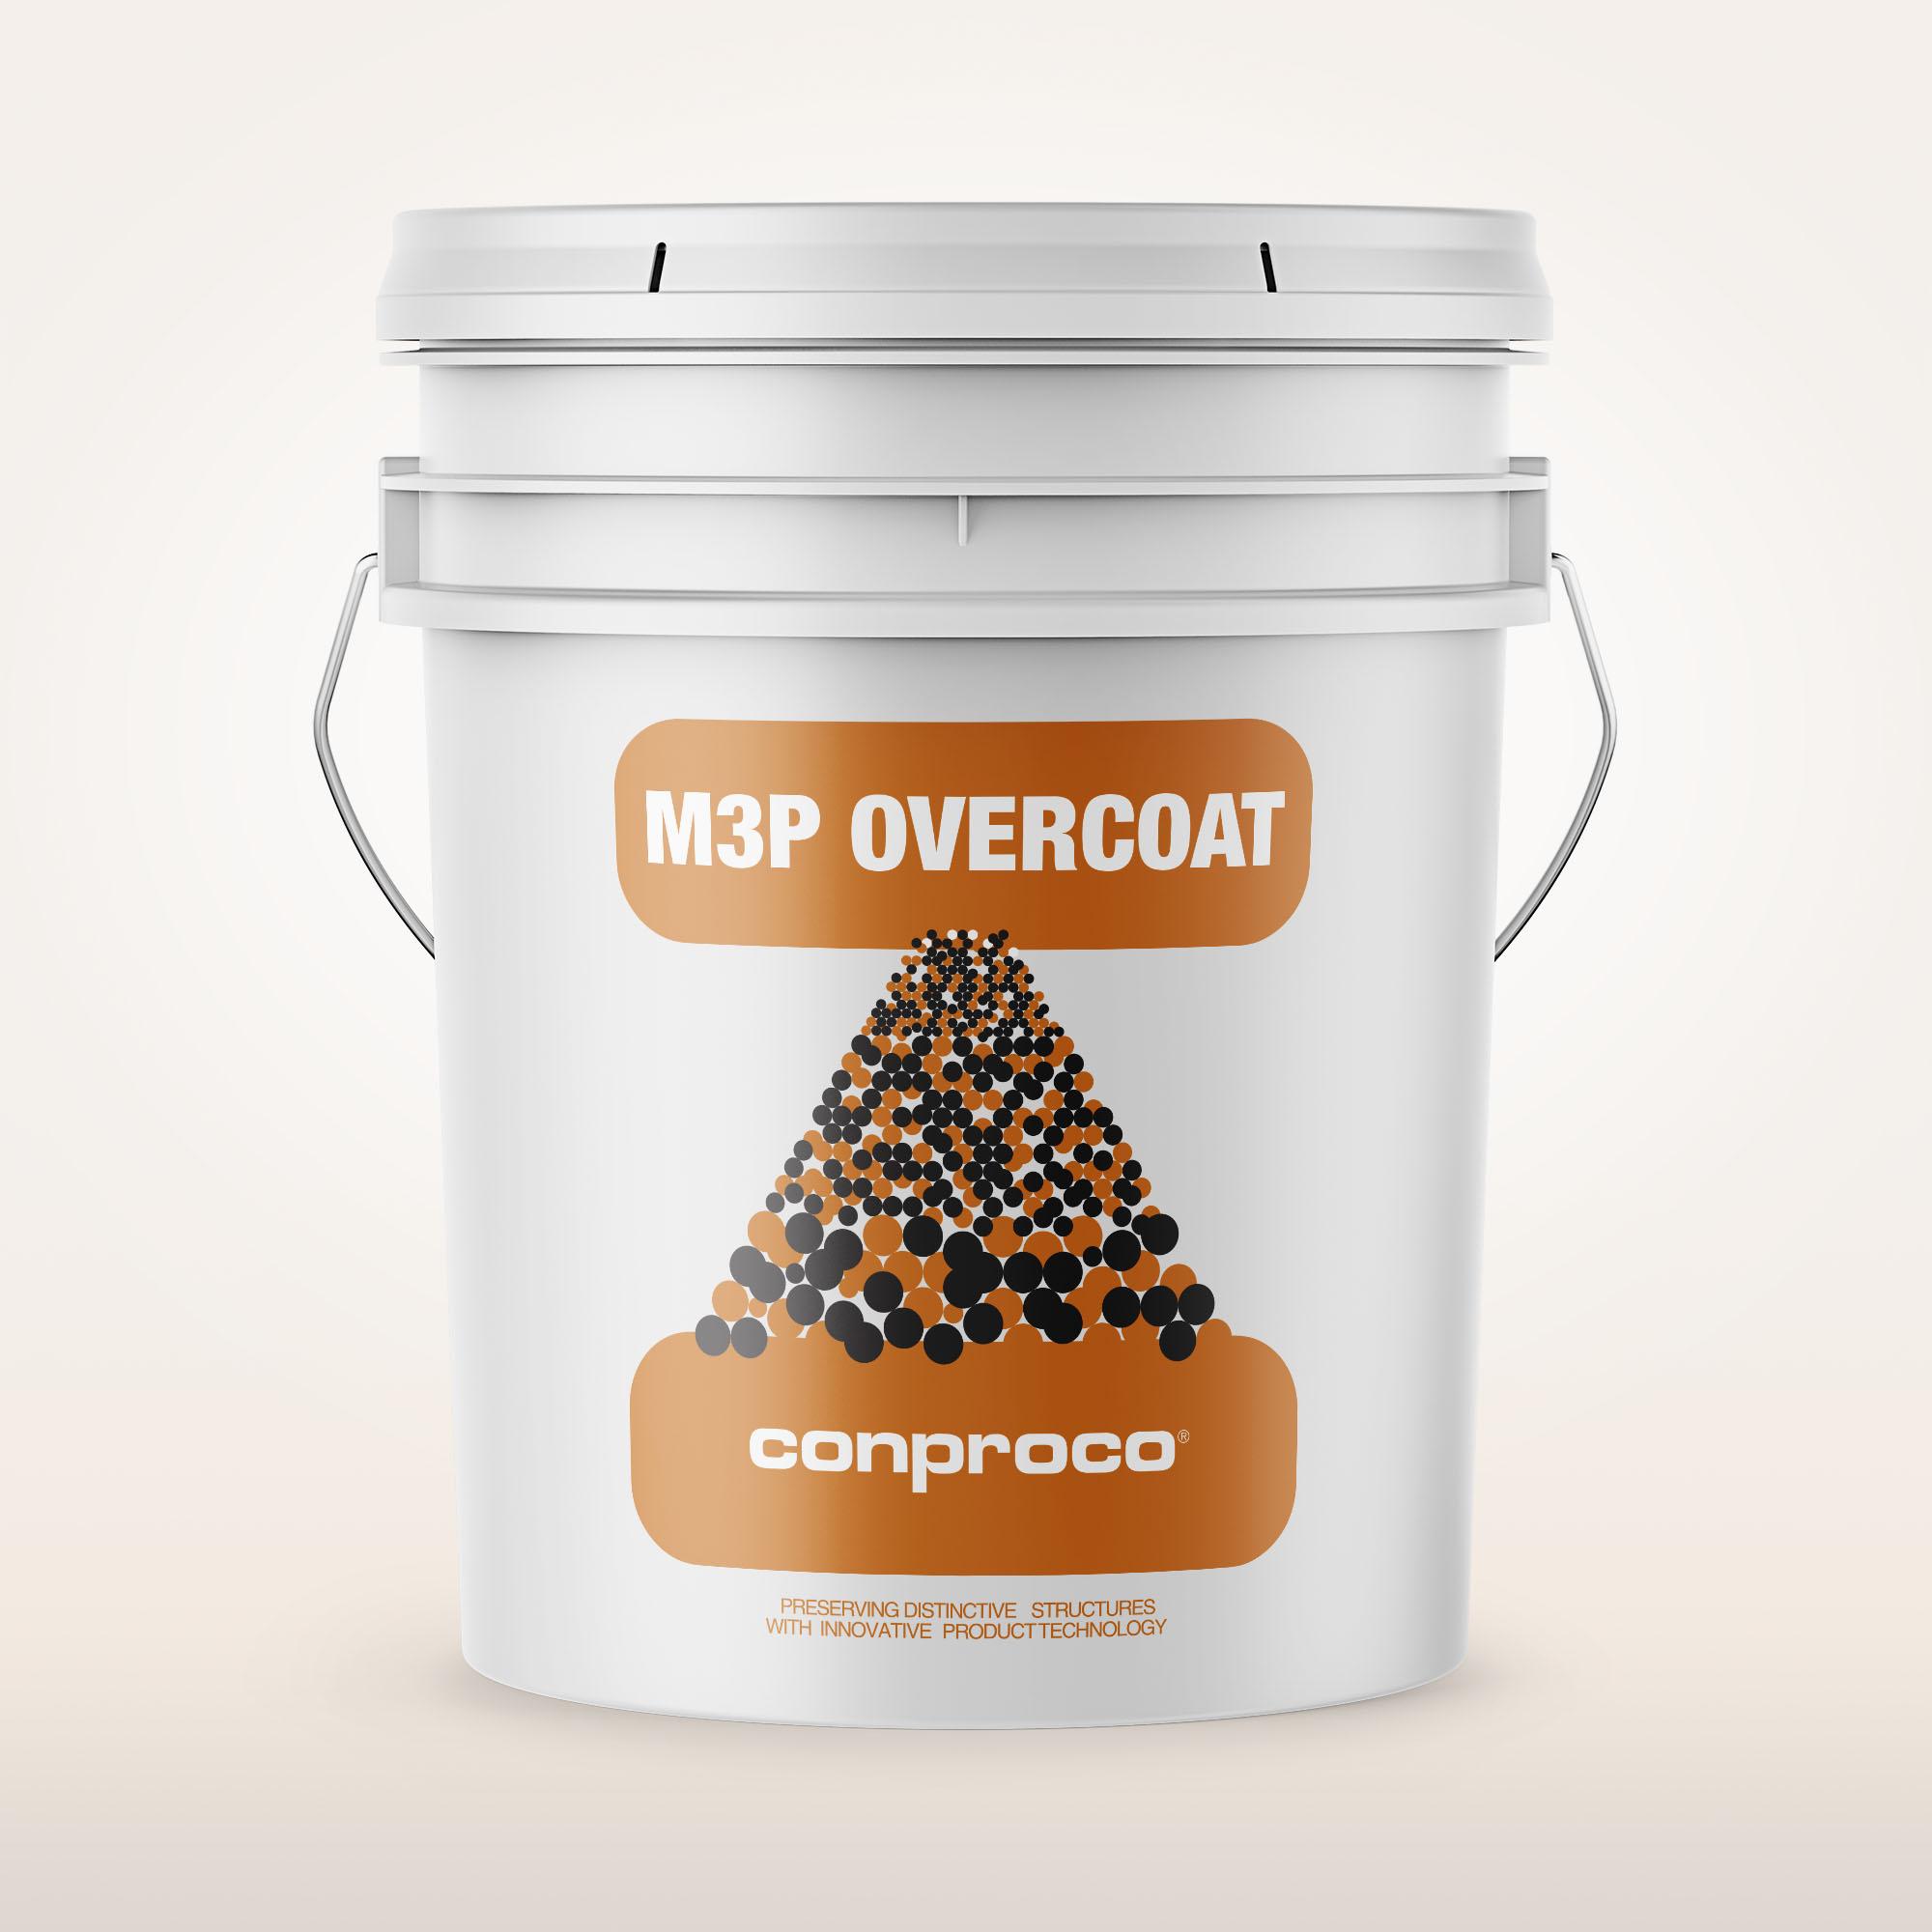 M3P Overcoat 5 gallon pail provides a breathable treatment for buildings